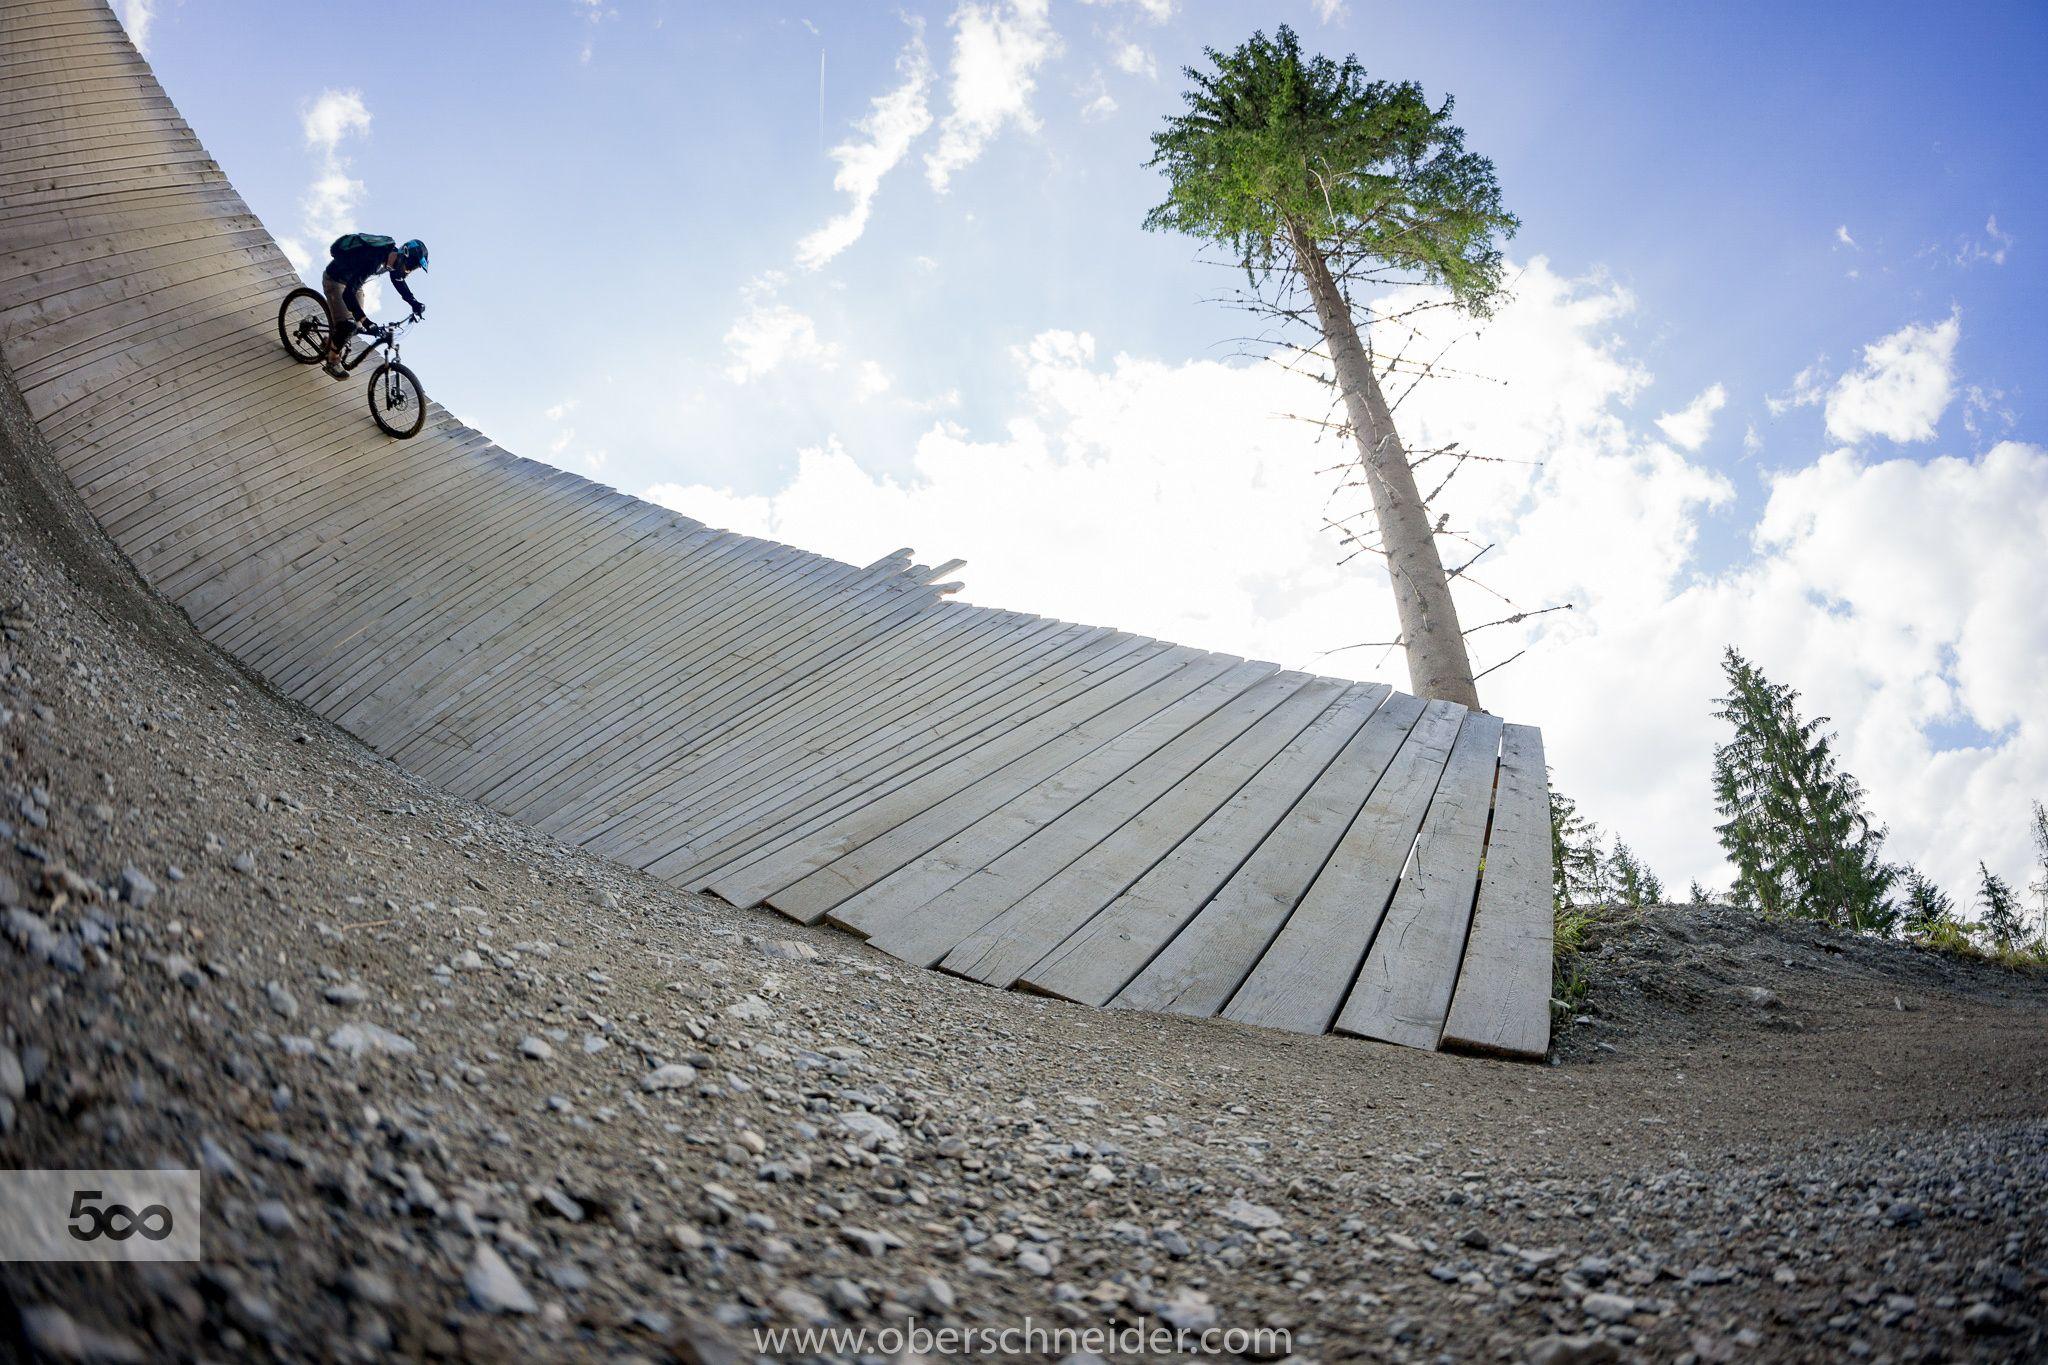 Bikepark freeride mountainbiking by christoph